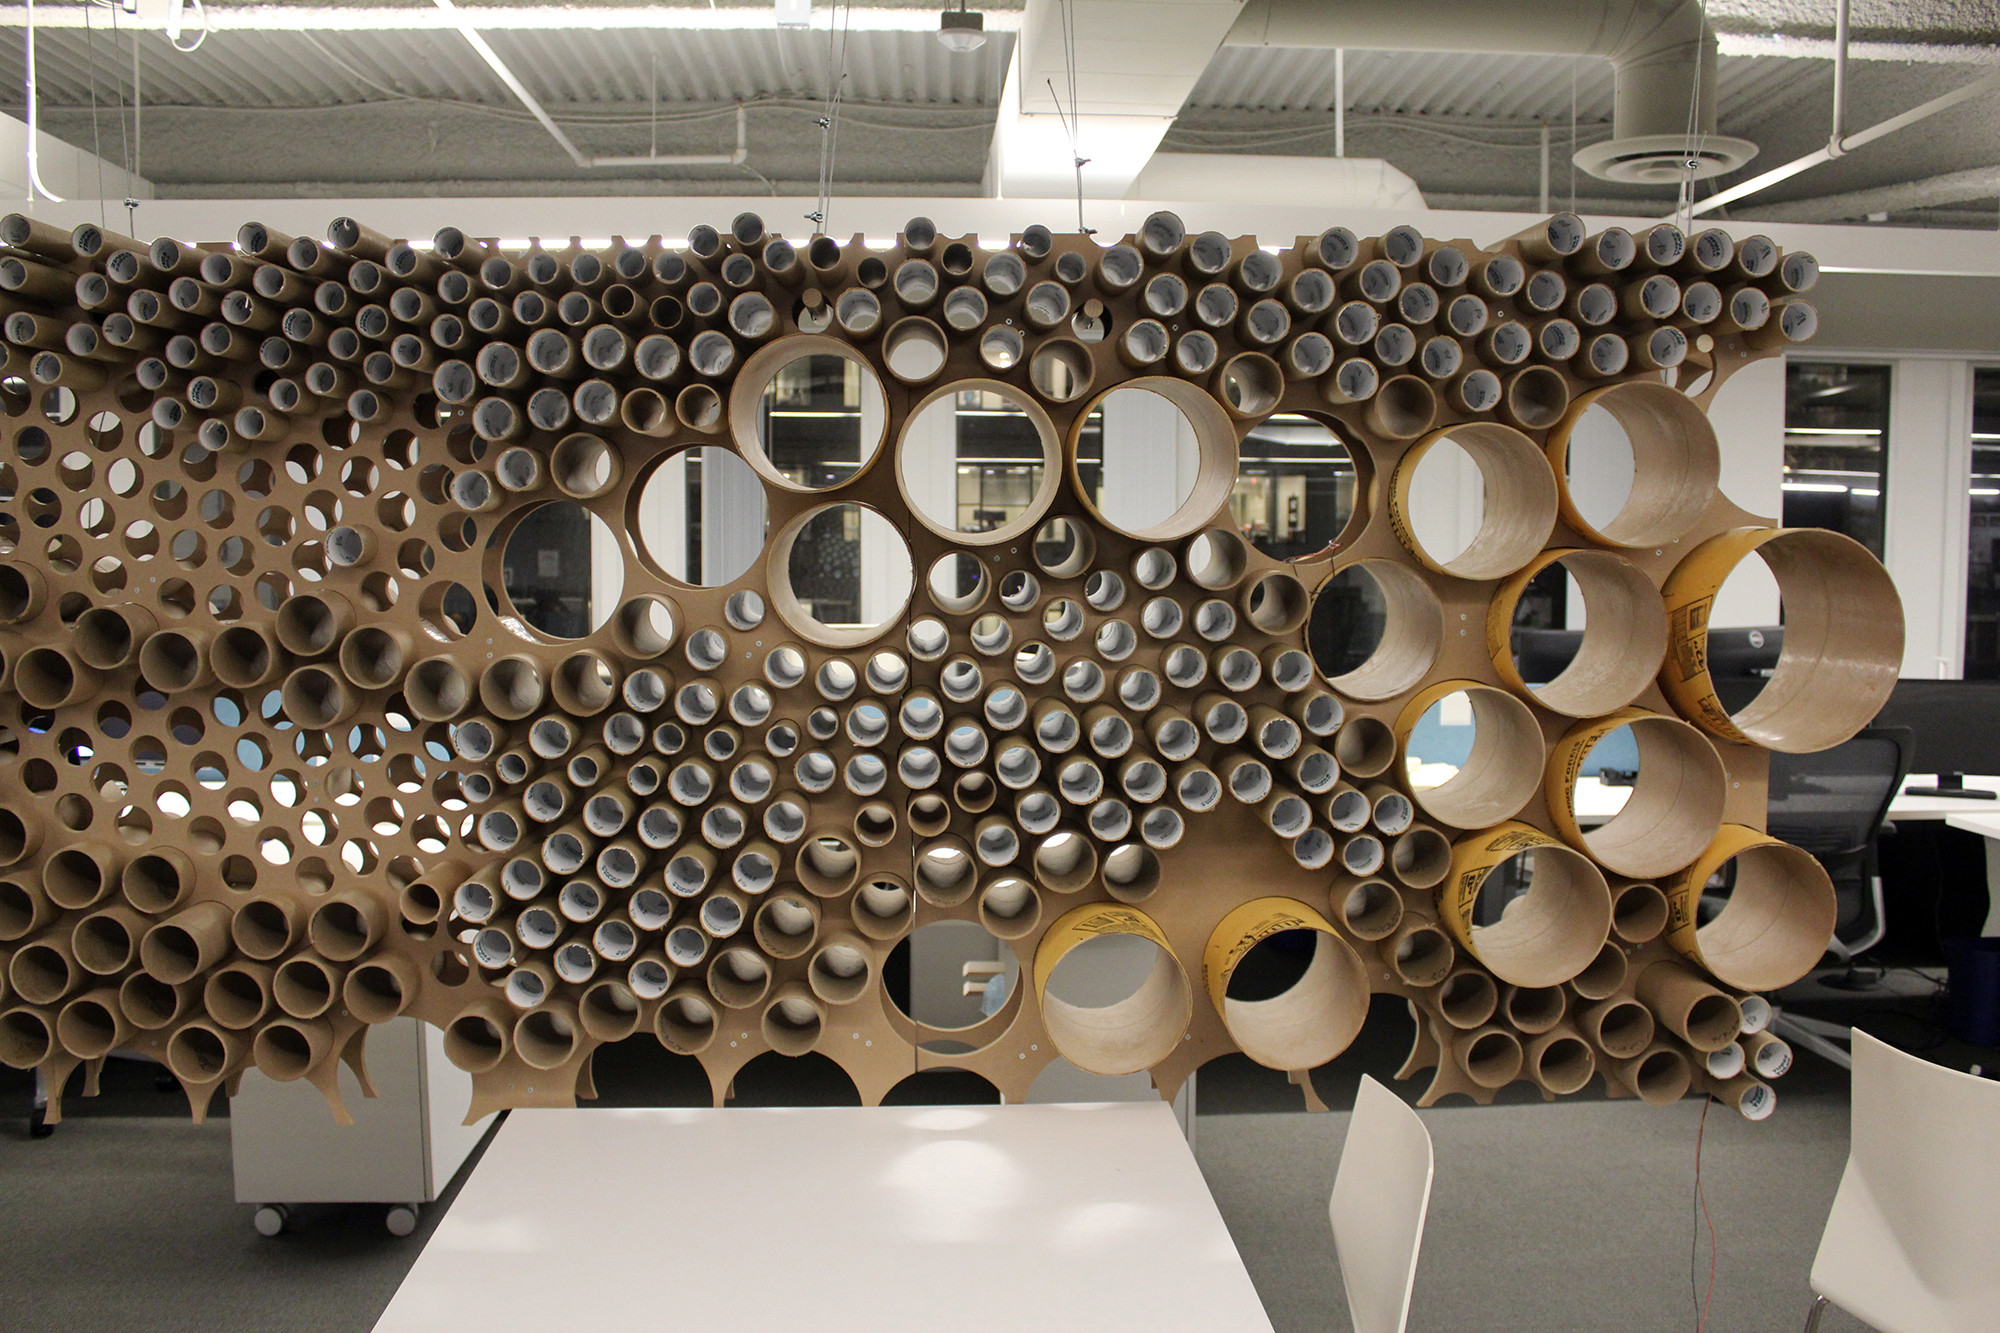 Perkins + Will's pared tubos separador oficinas cardboard tubes barrier